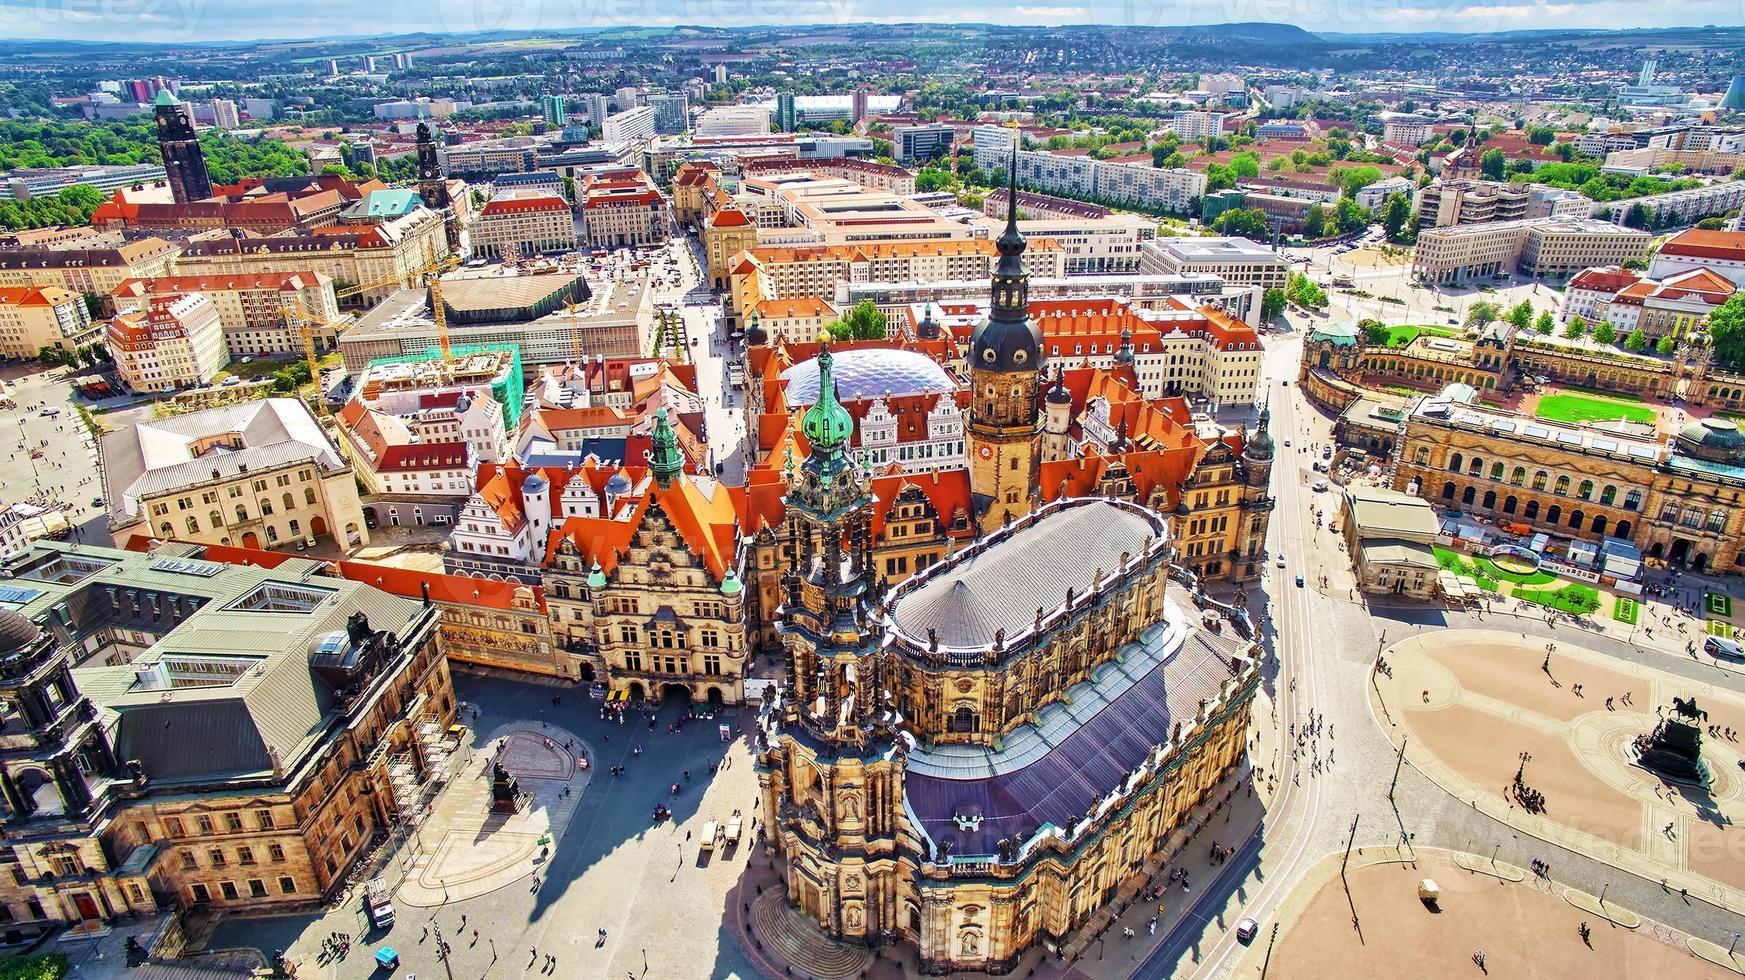 Centro histórico del casco antiguo de Dresden. foto